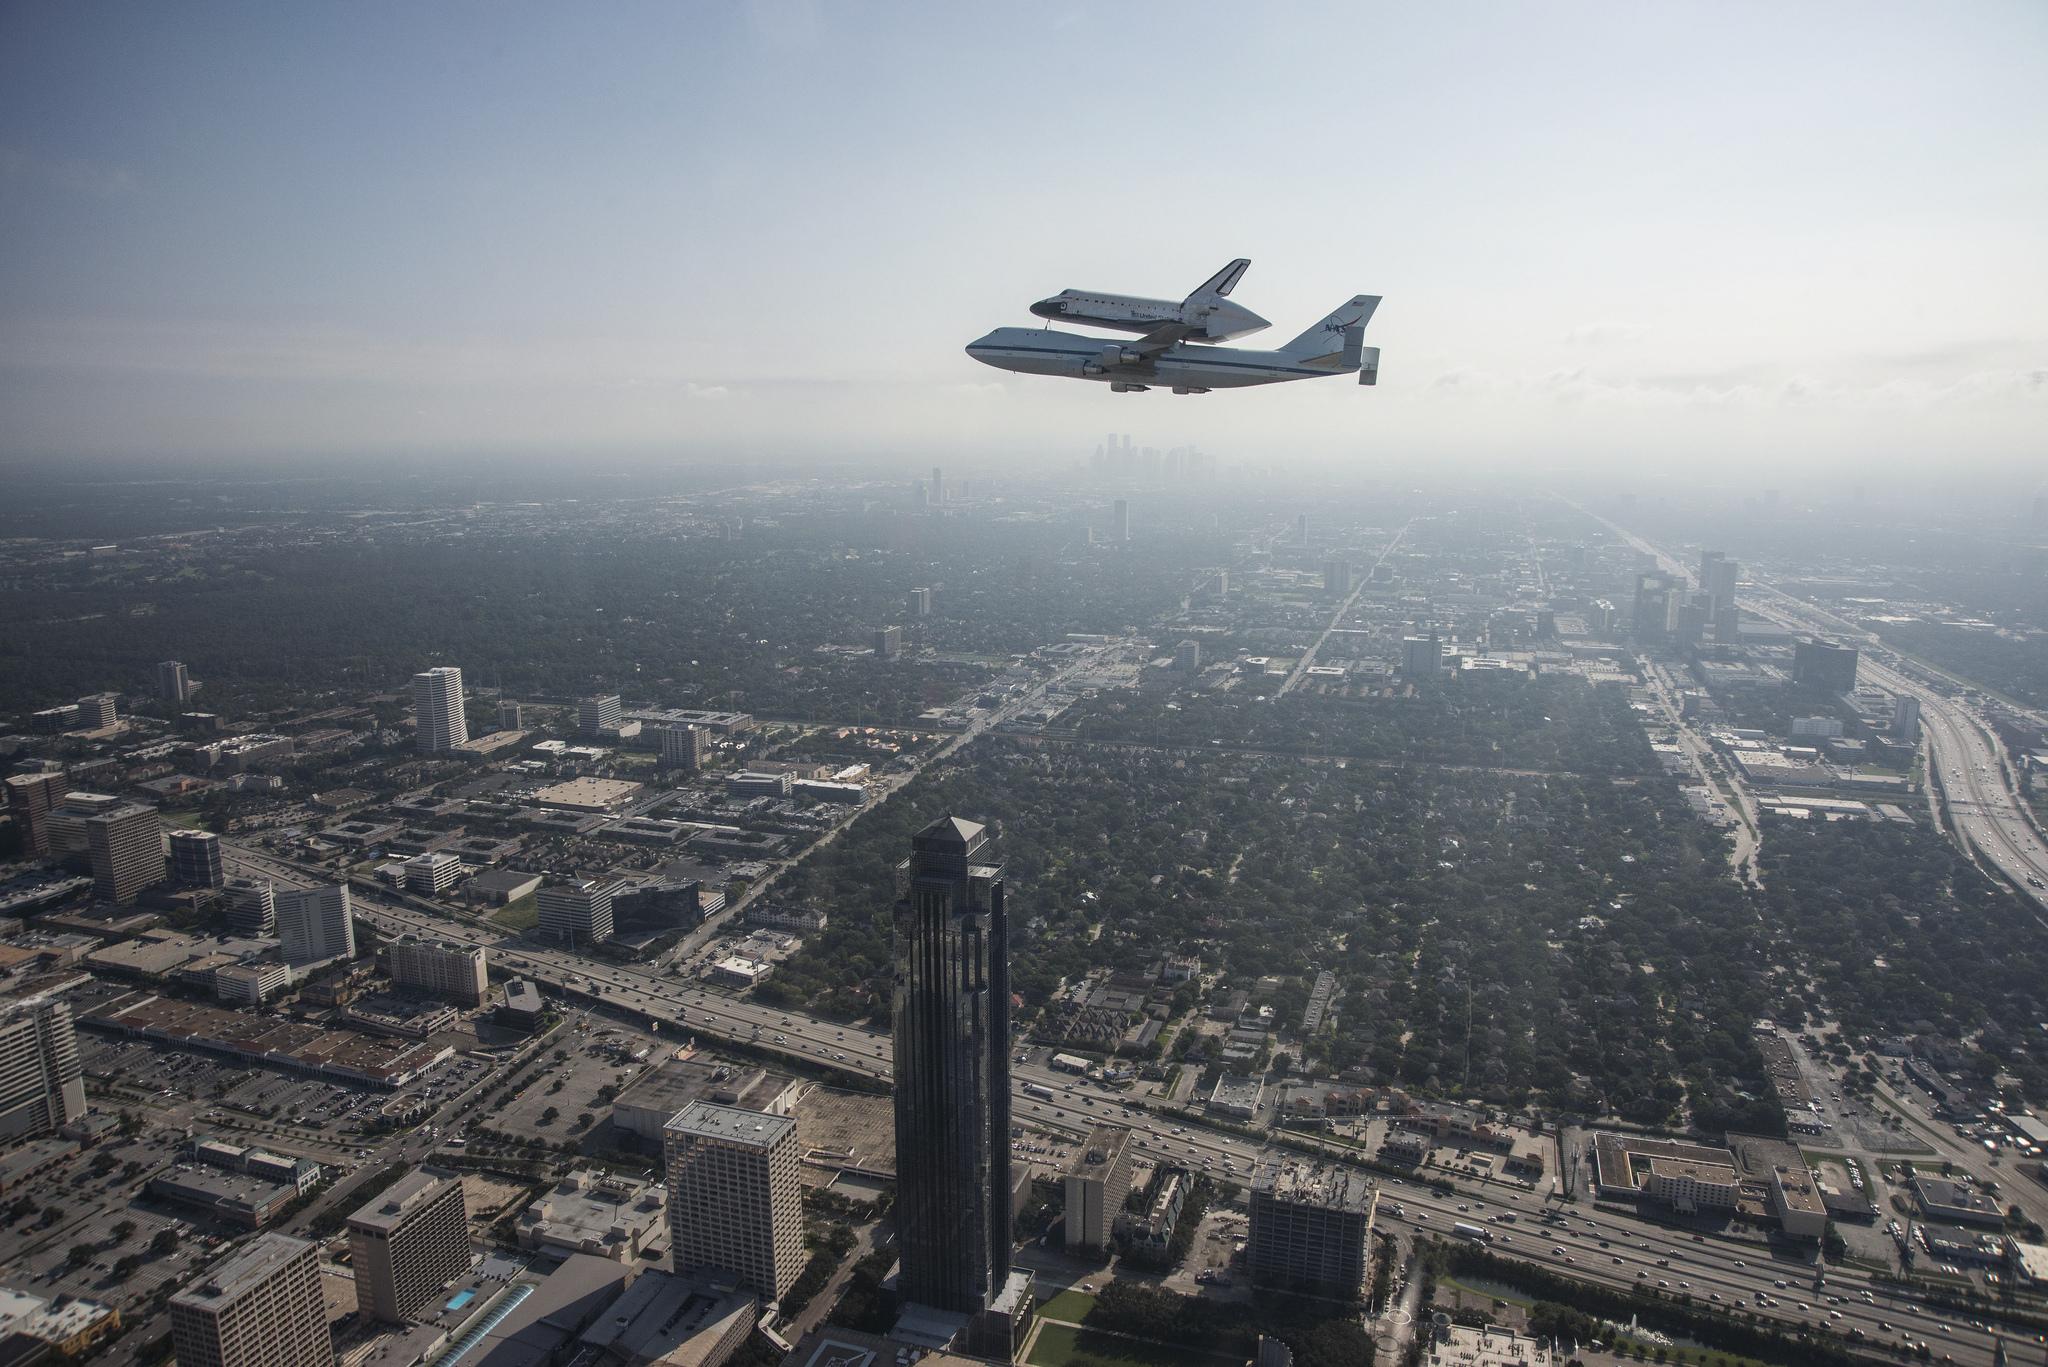 space shuttle landing in houston - photo #16